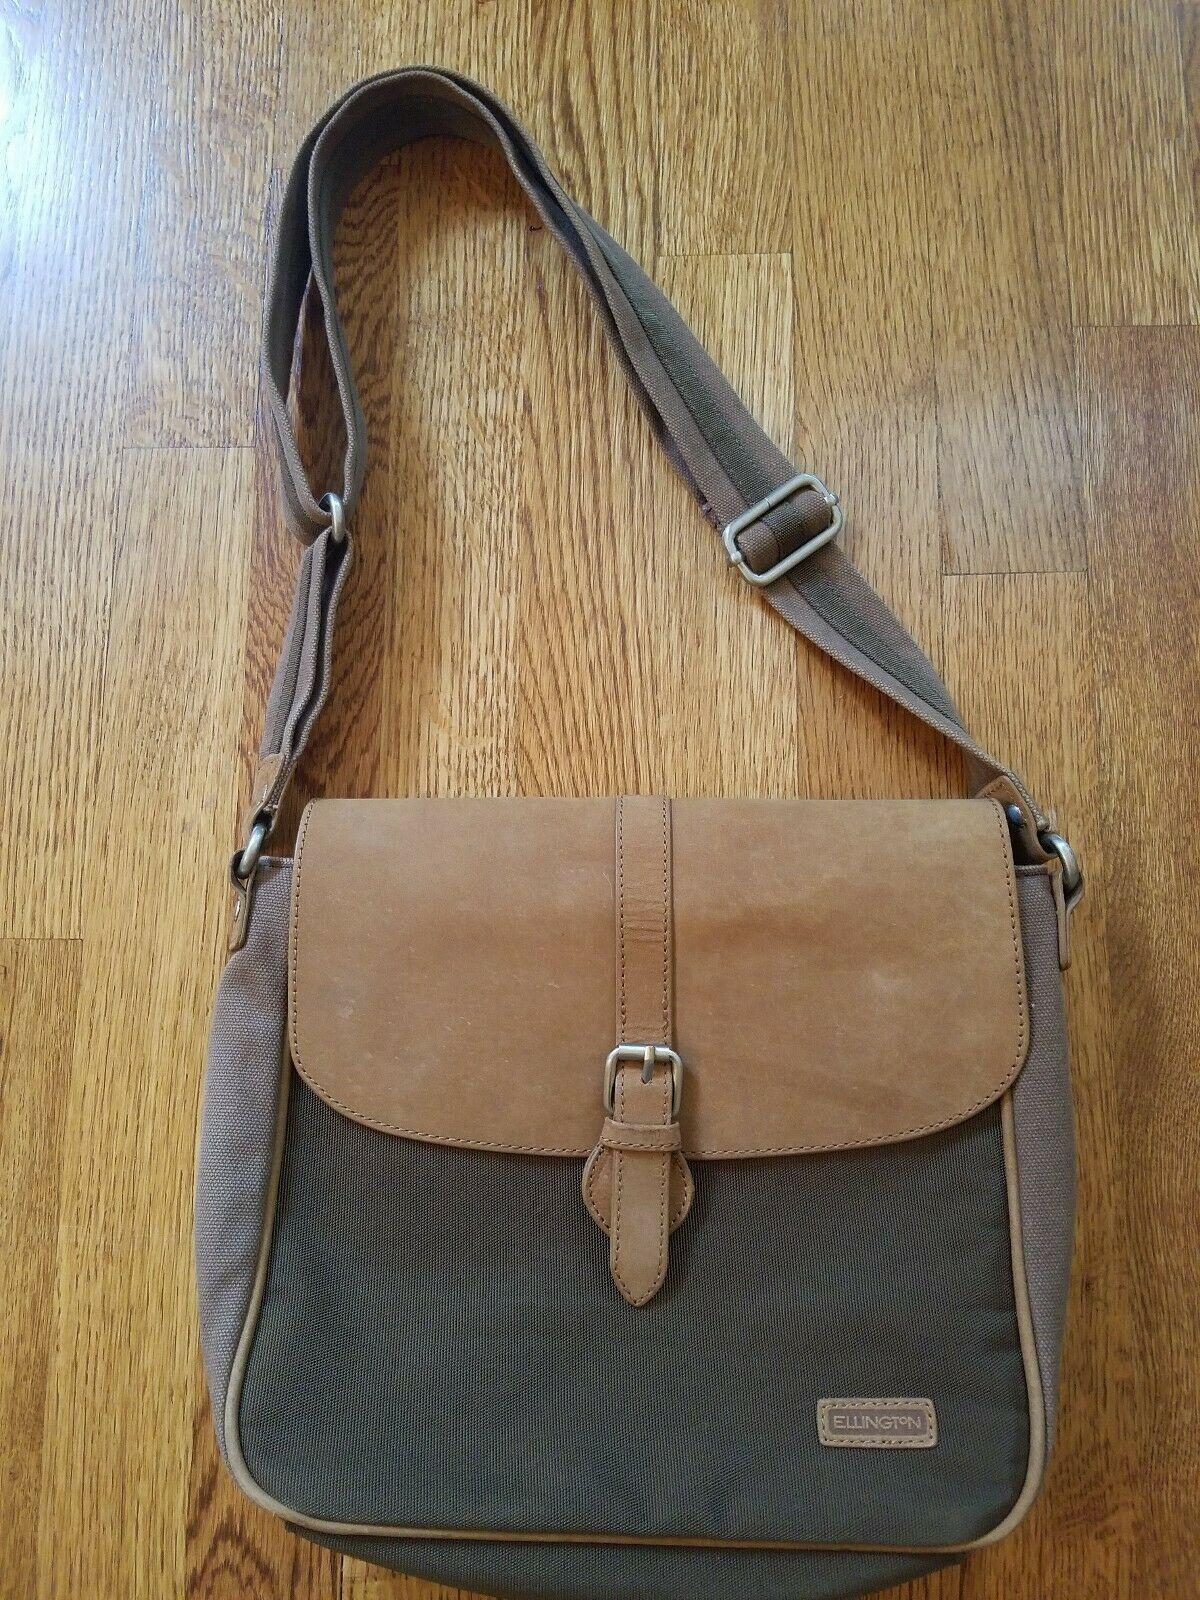 Handbag Satchel Crossbody Purse